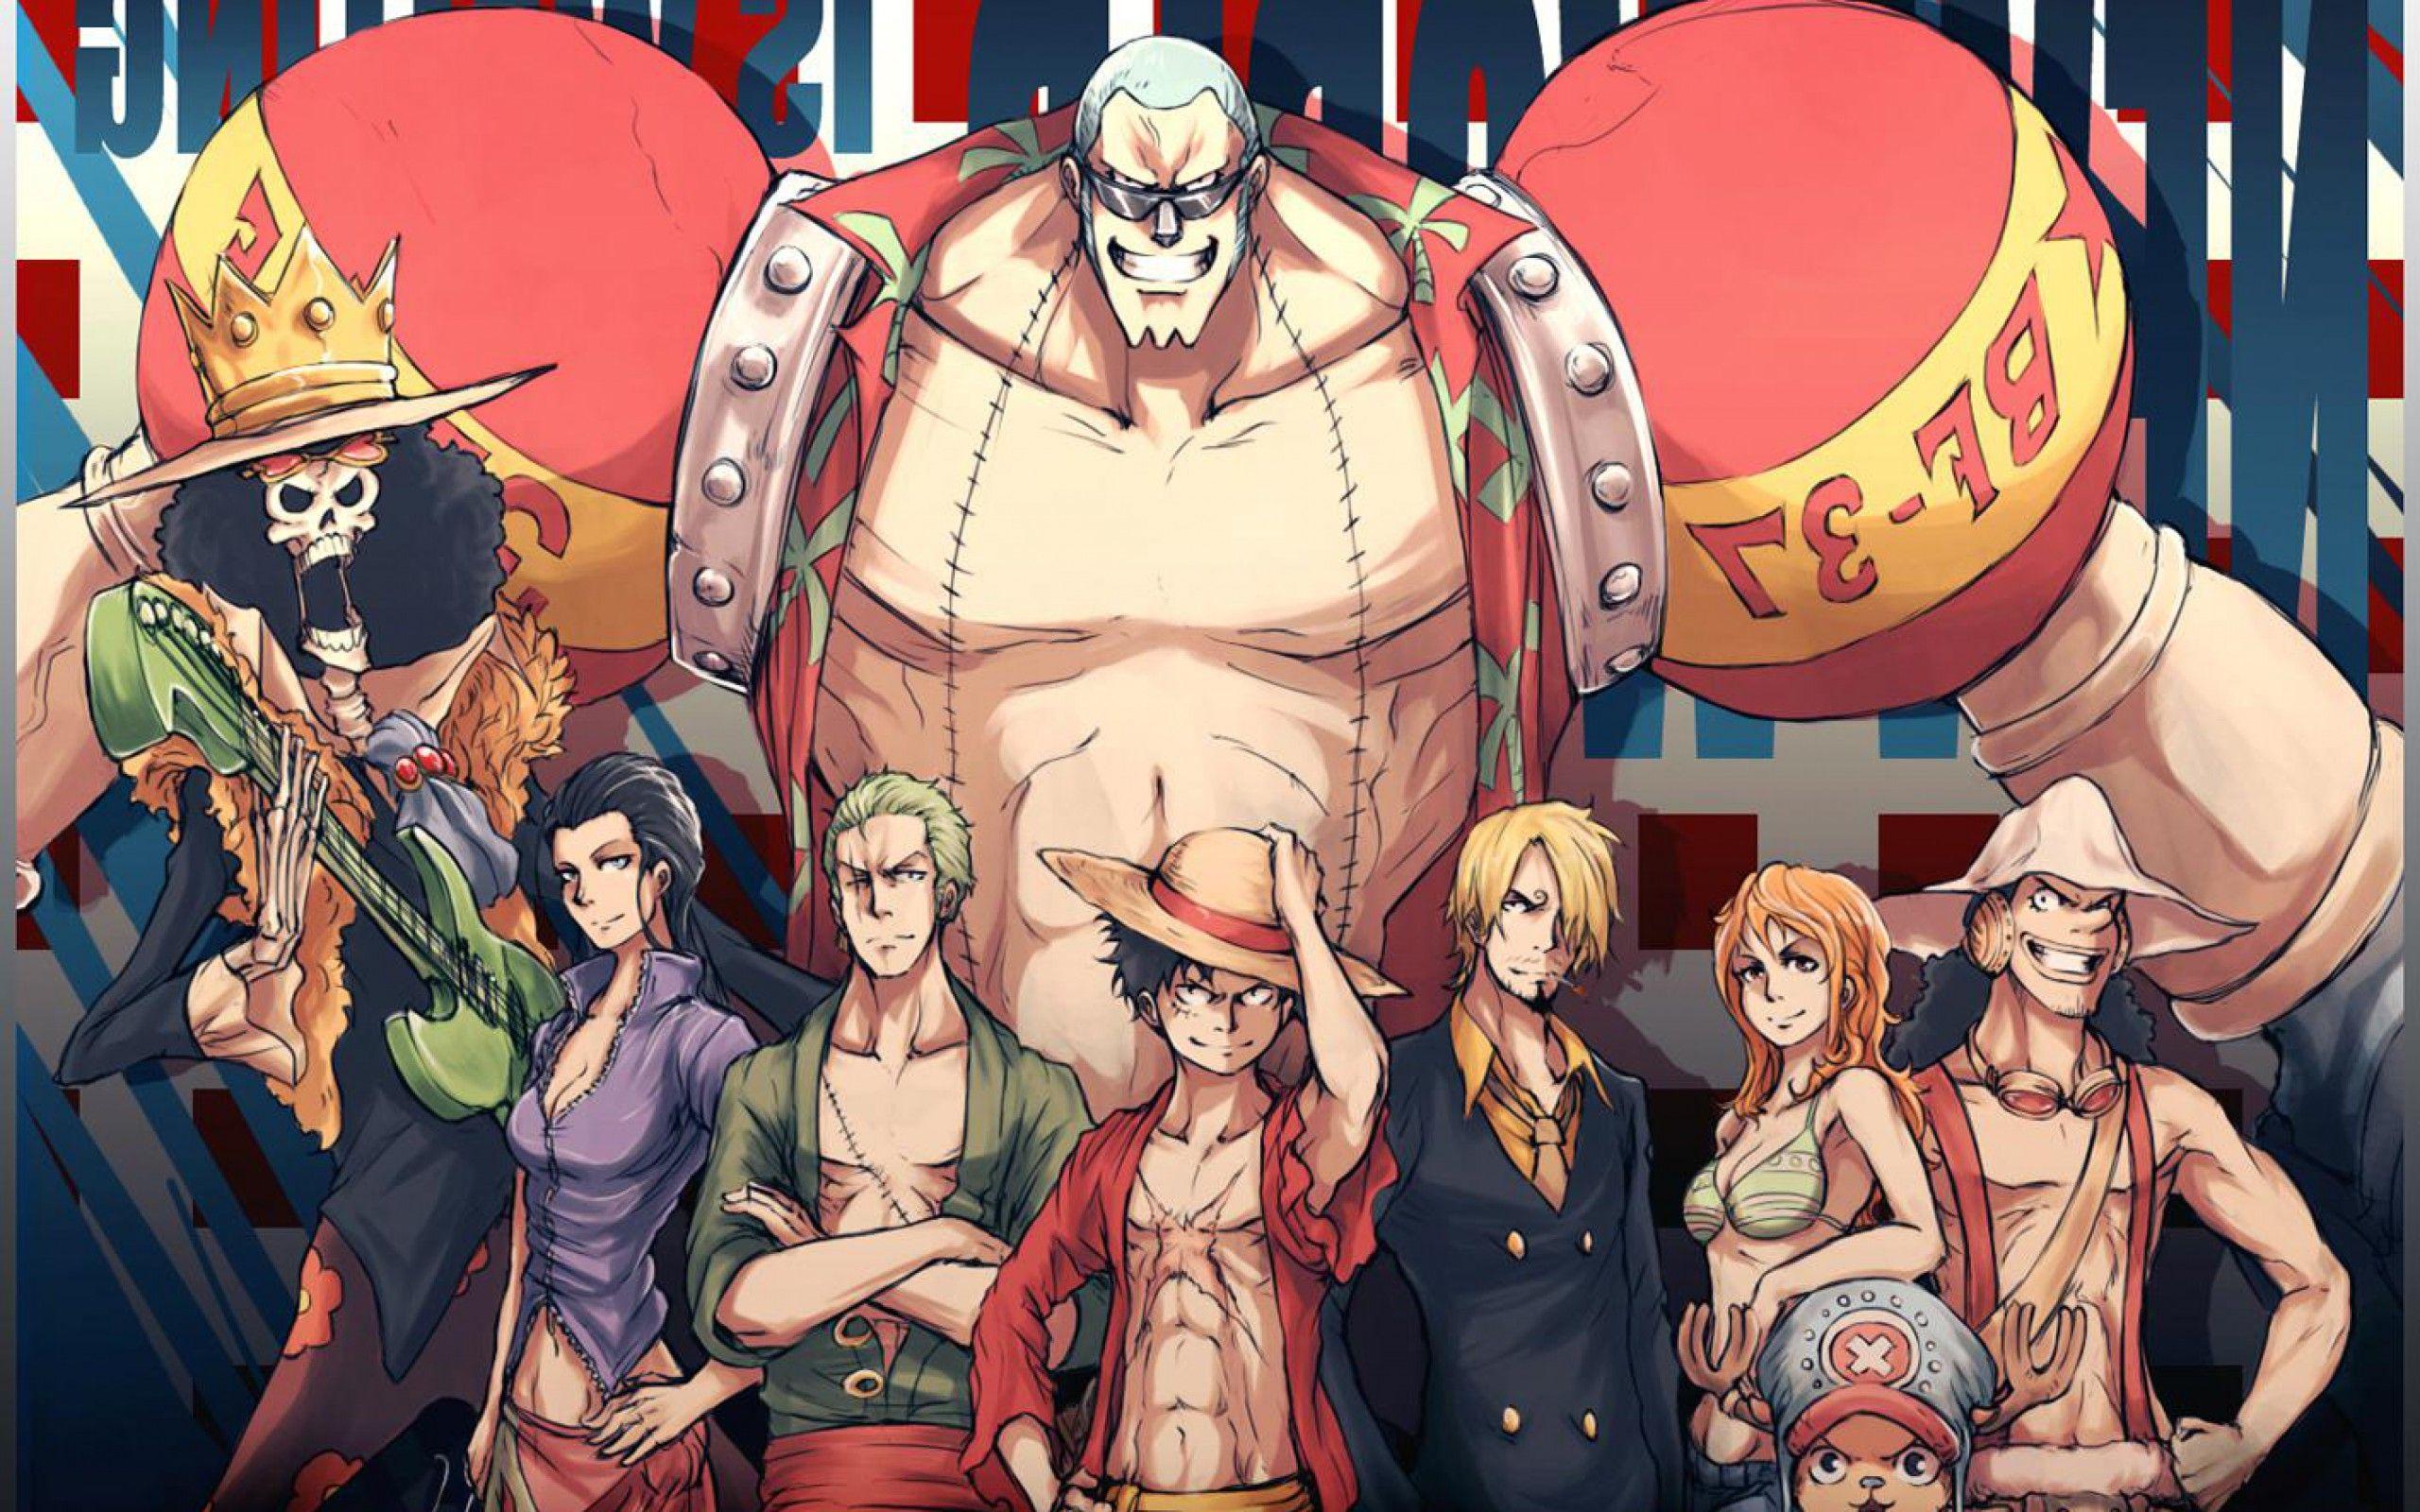 best crew one piece anime hd desktop wallpapers picture wallpaper